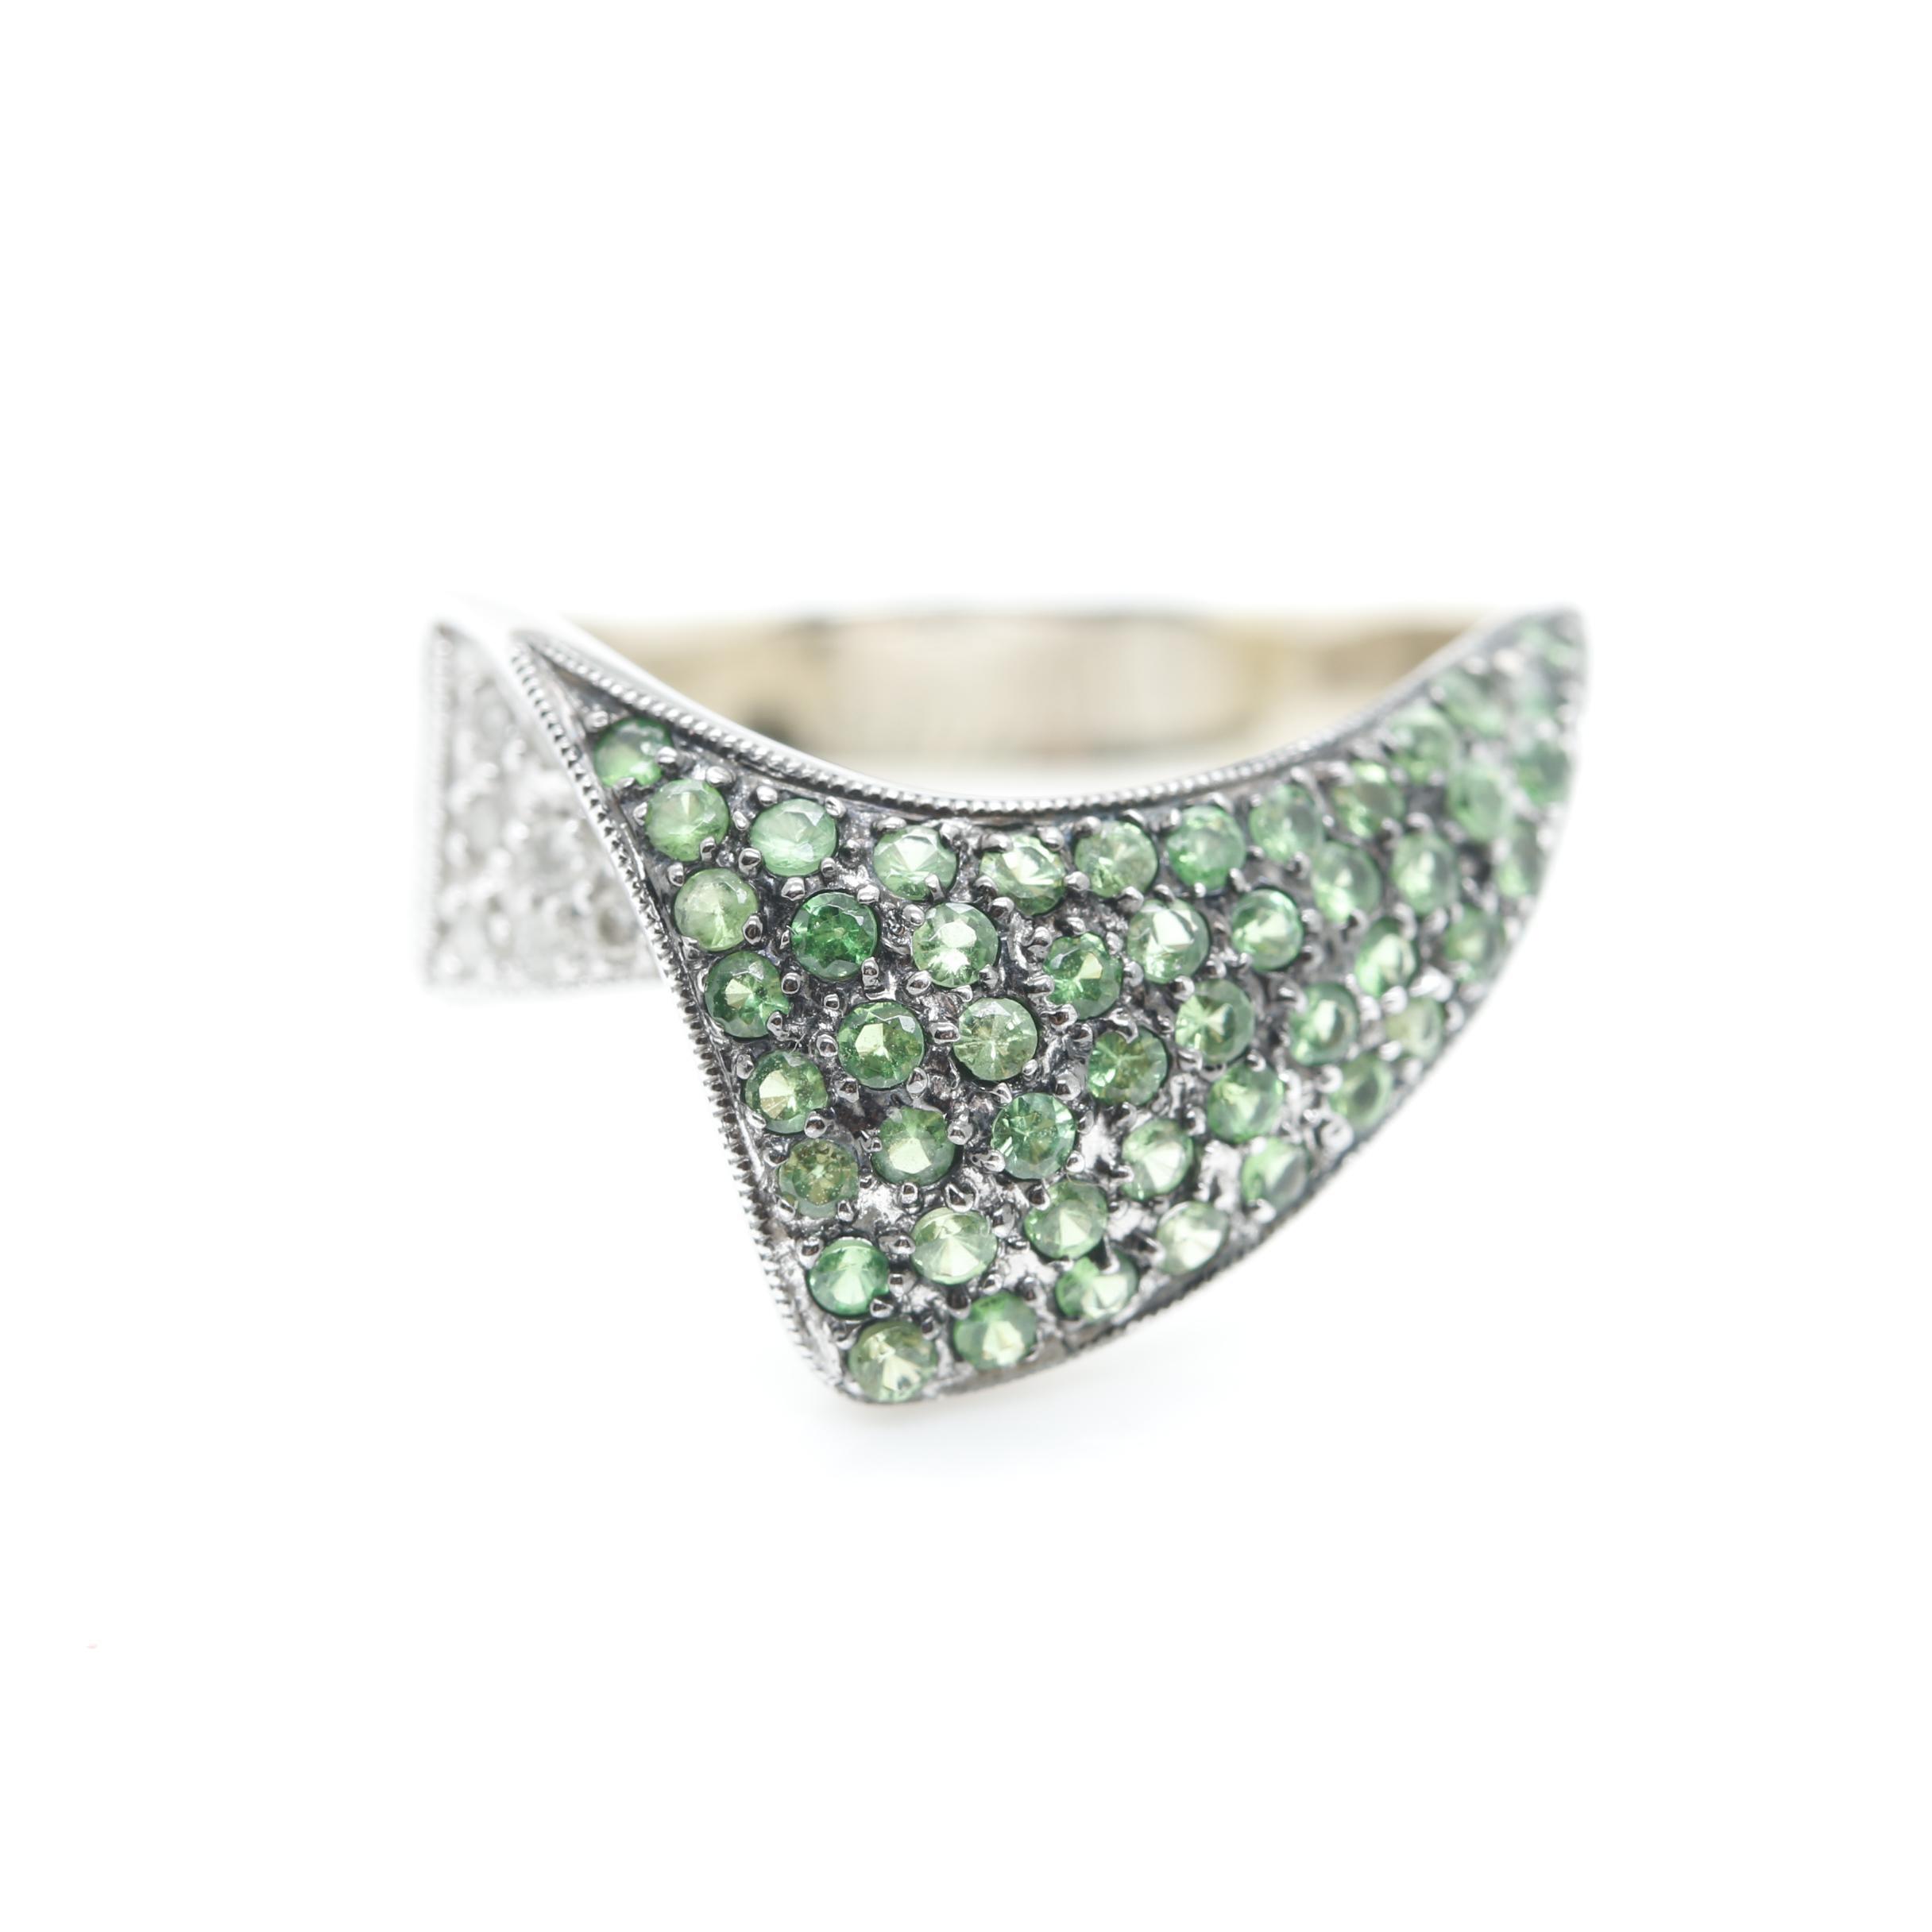 14K White Gold 1.20 CTW Diamond and Tsavorite Garnet Ring